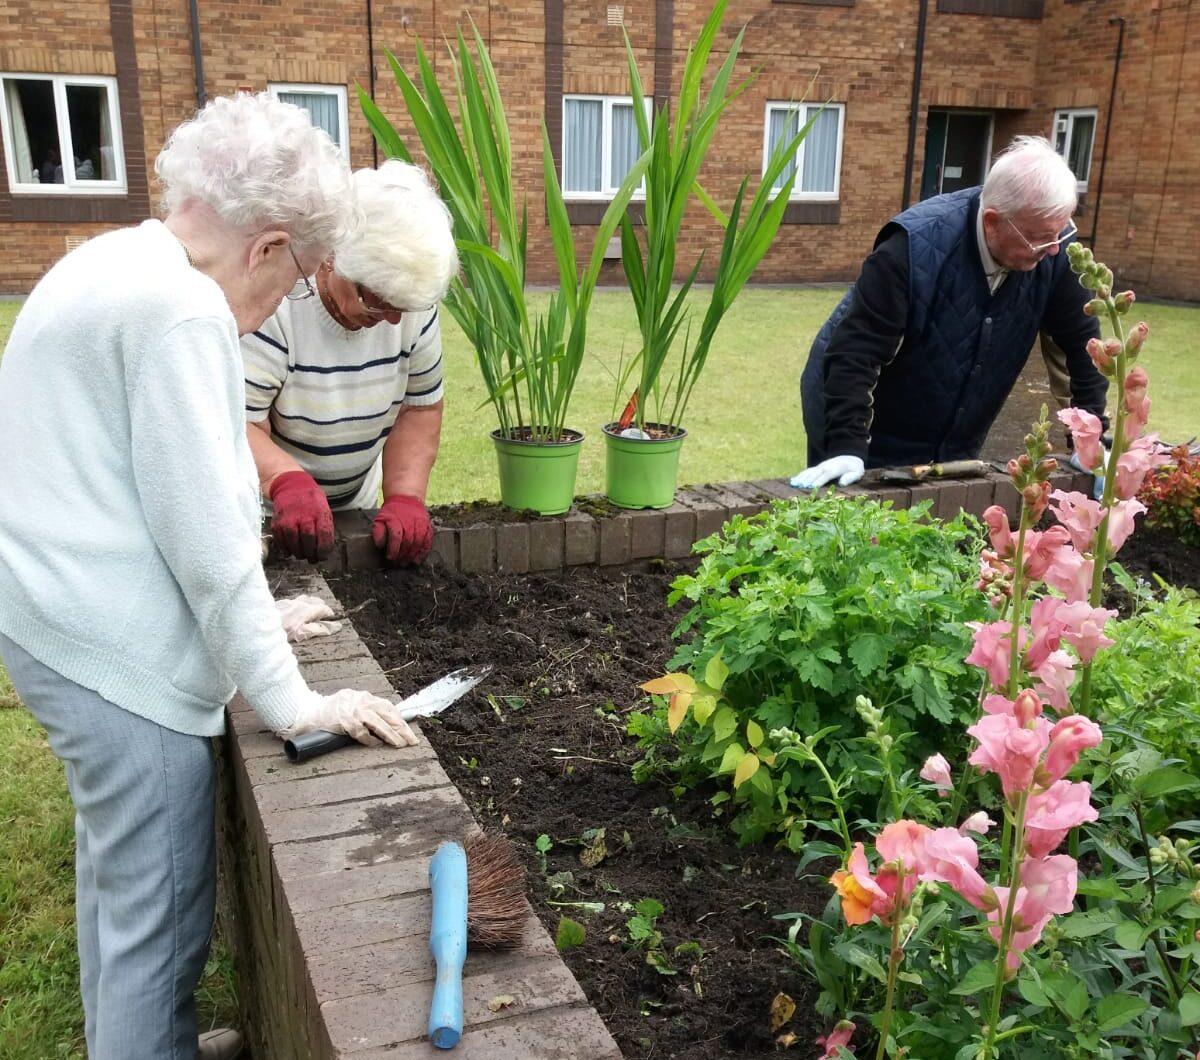 Residents tending to the community garden